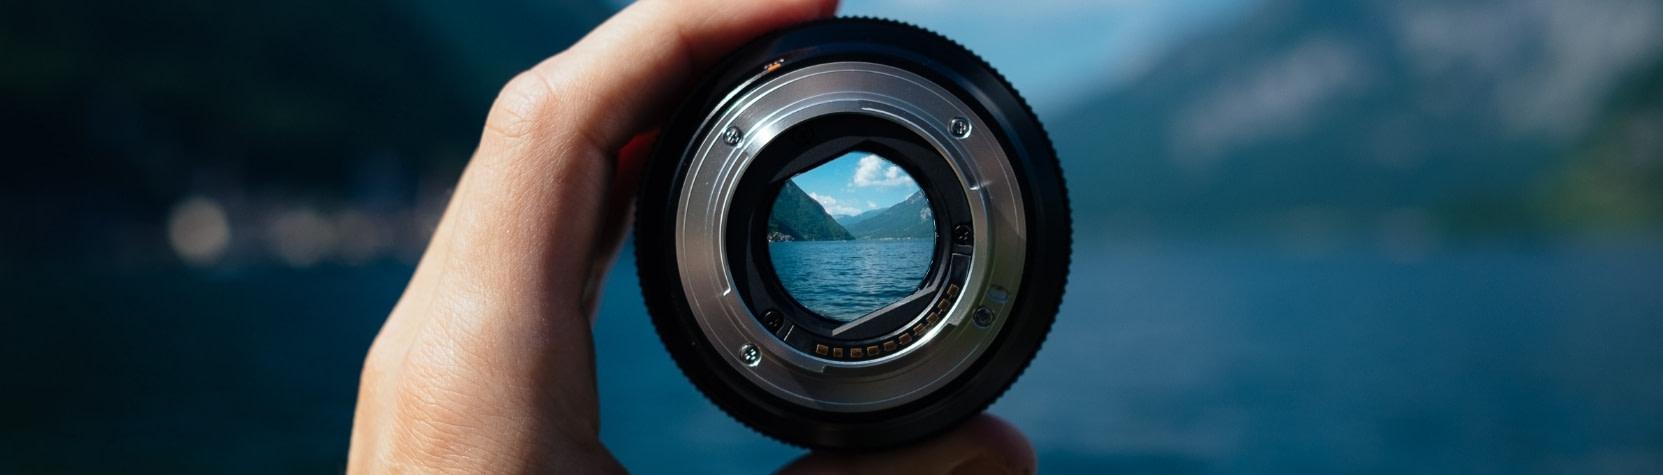 Vds training consultants blog tools mentale kracht ontwikkelen aandachtscontrole